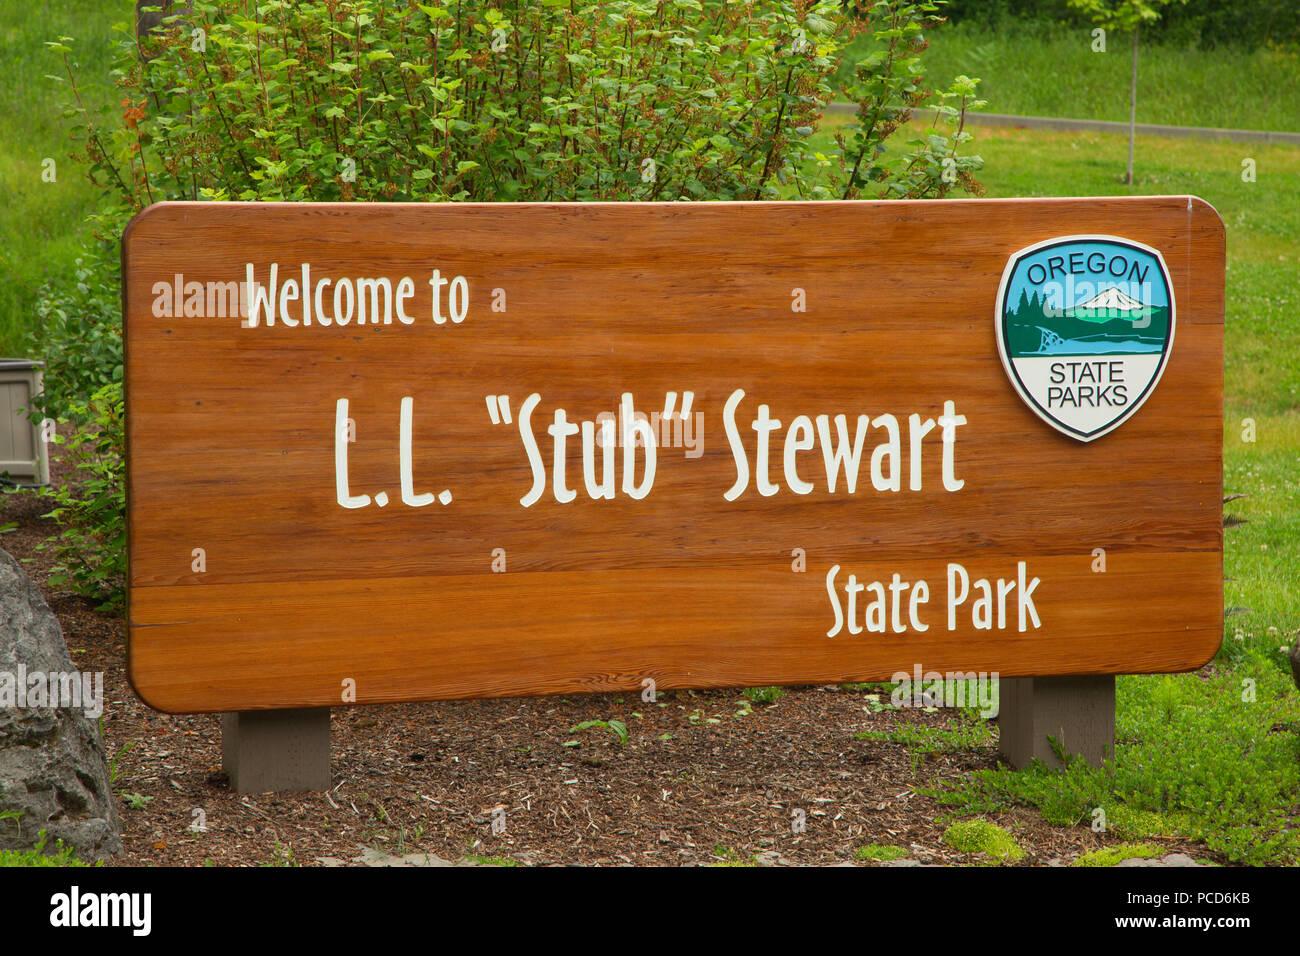 Sign at Welcome Center, Stub Stewart State Park, Oregon - Stock Image